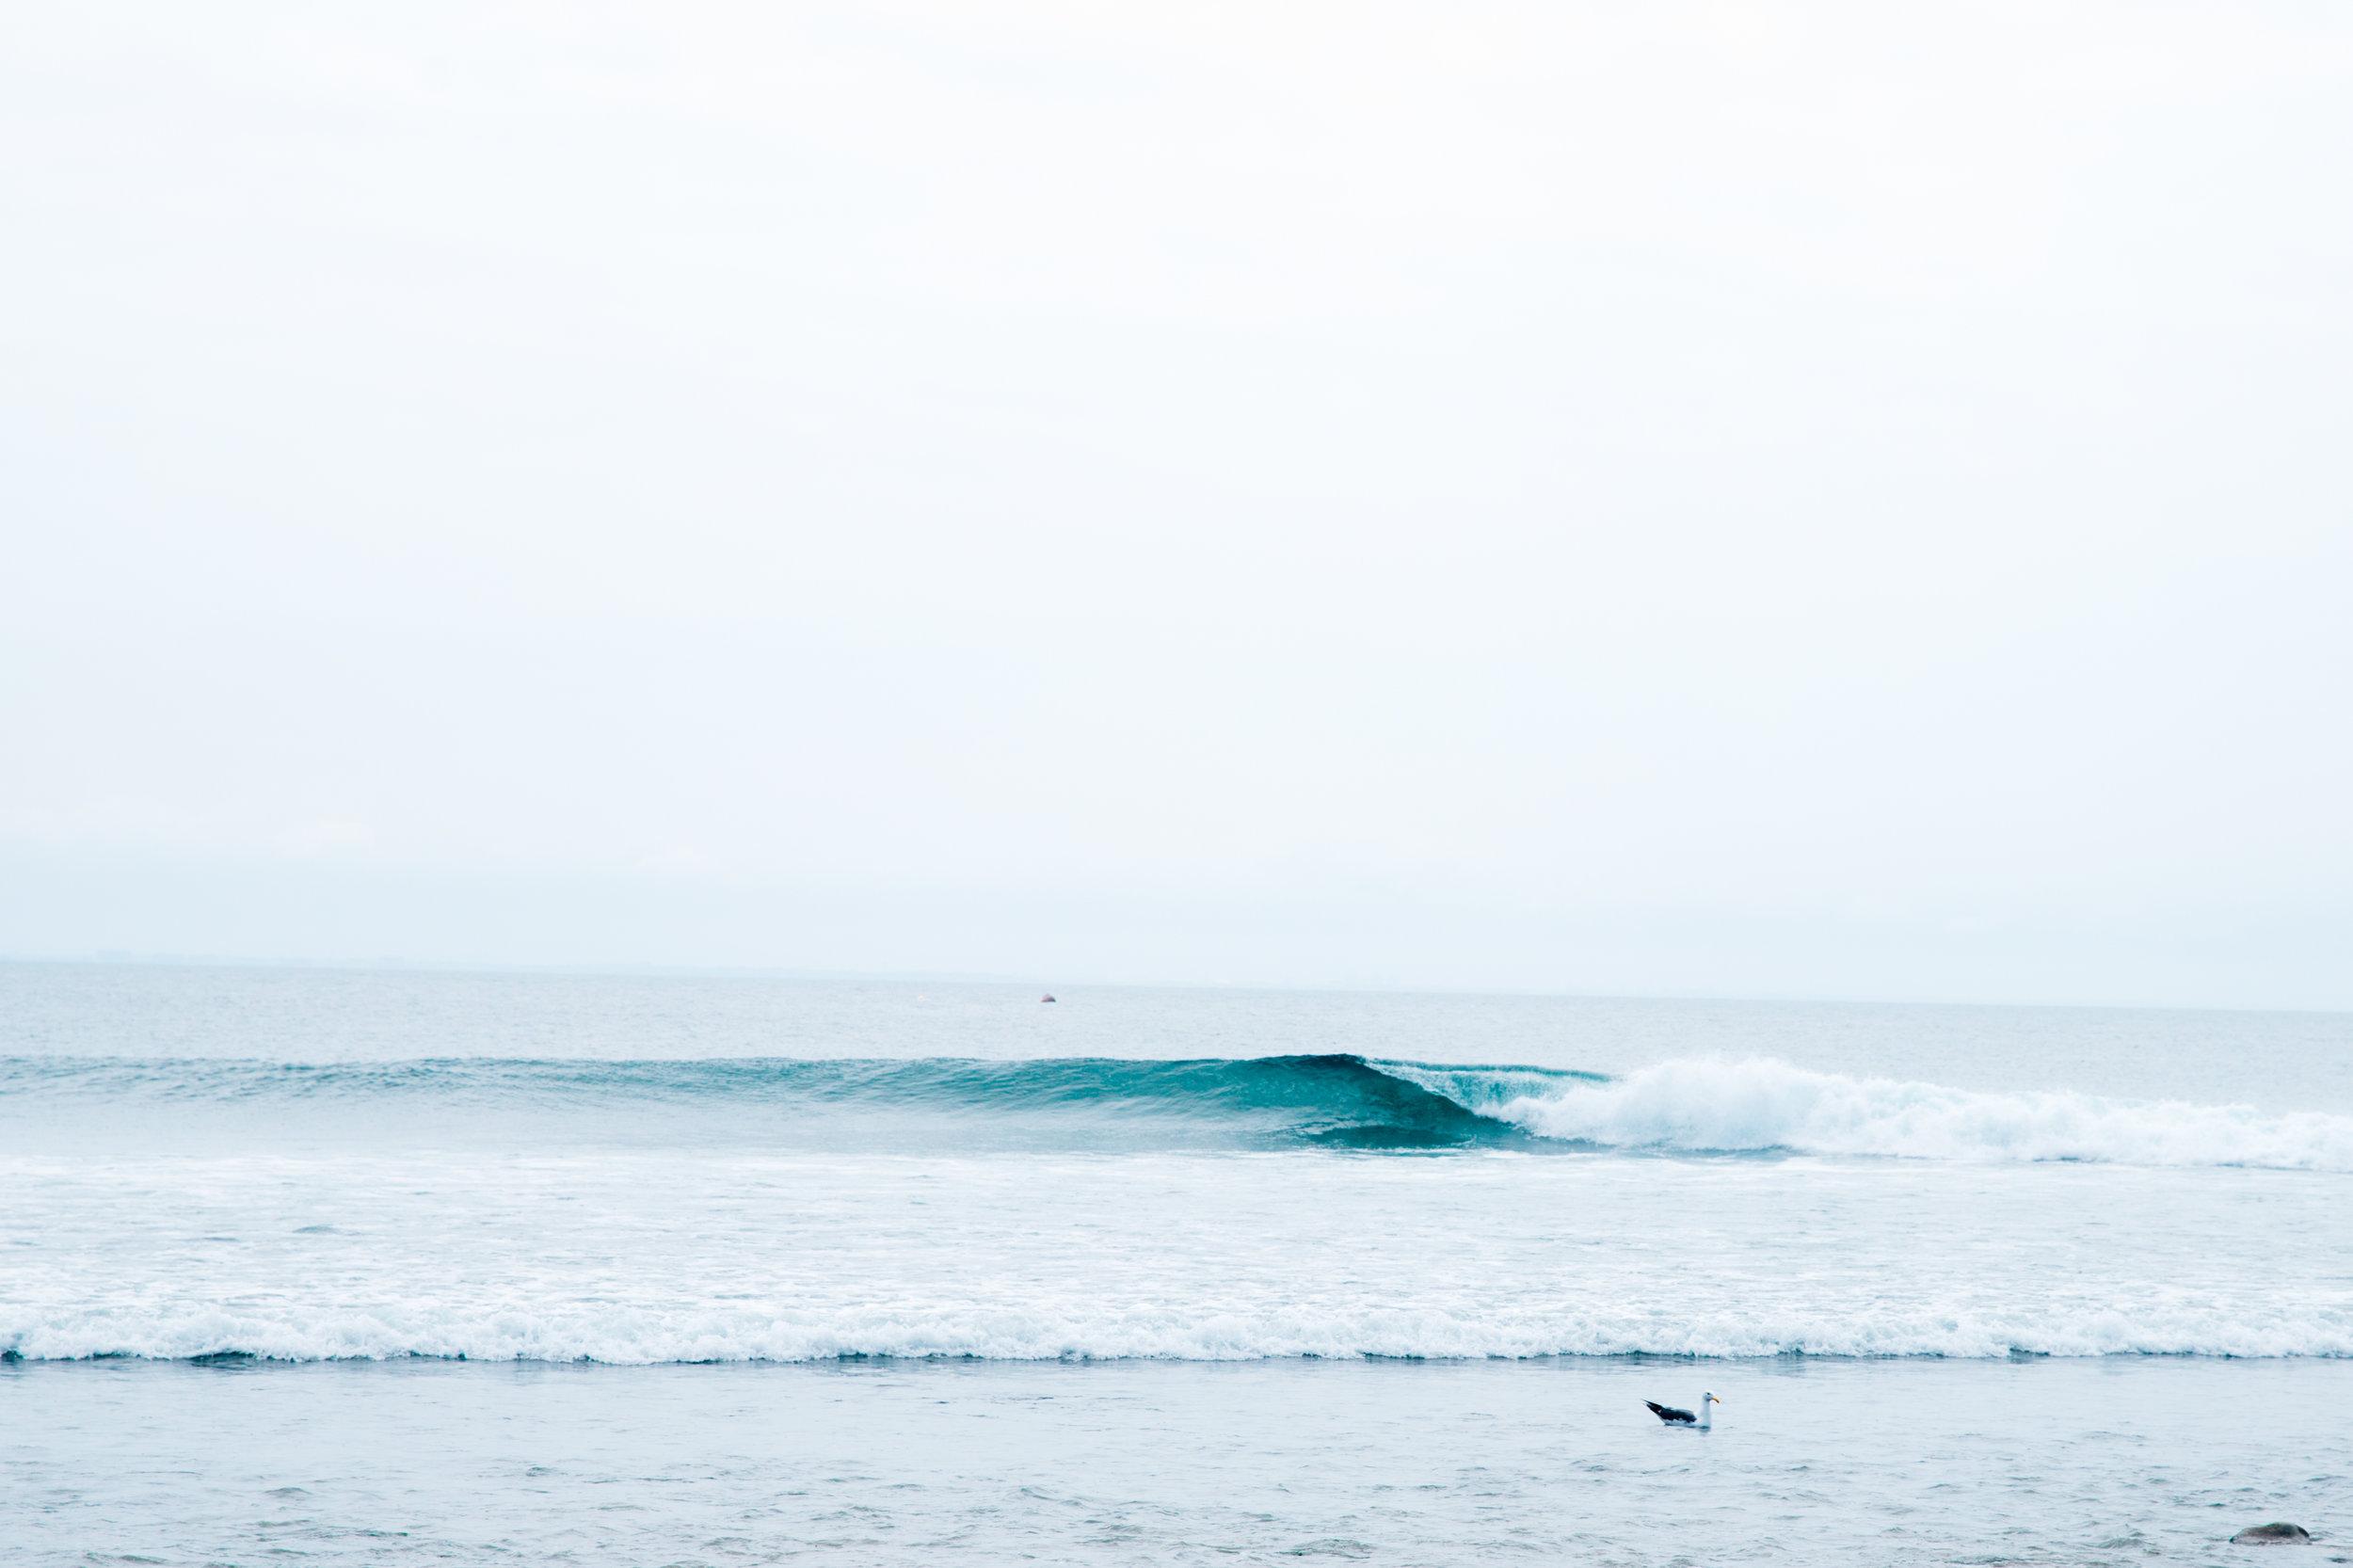 Malibu_surf_by_leiavita